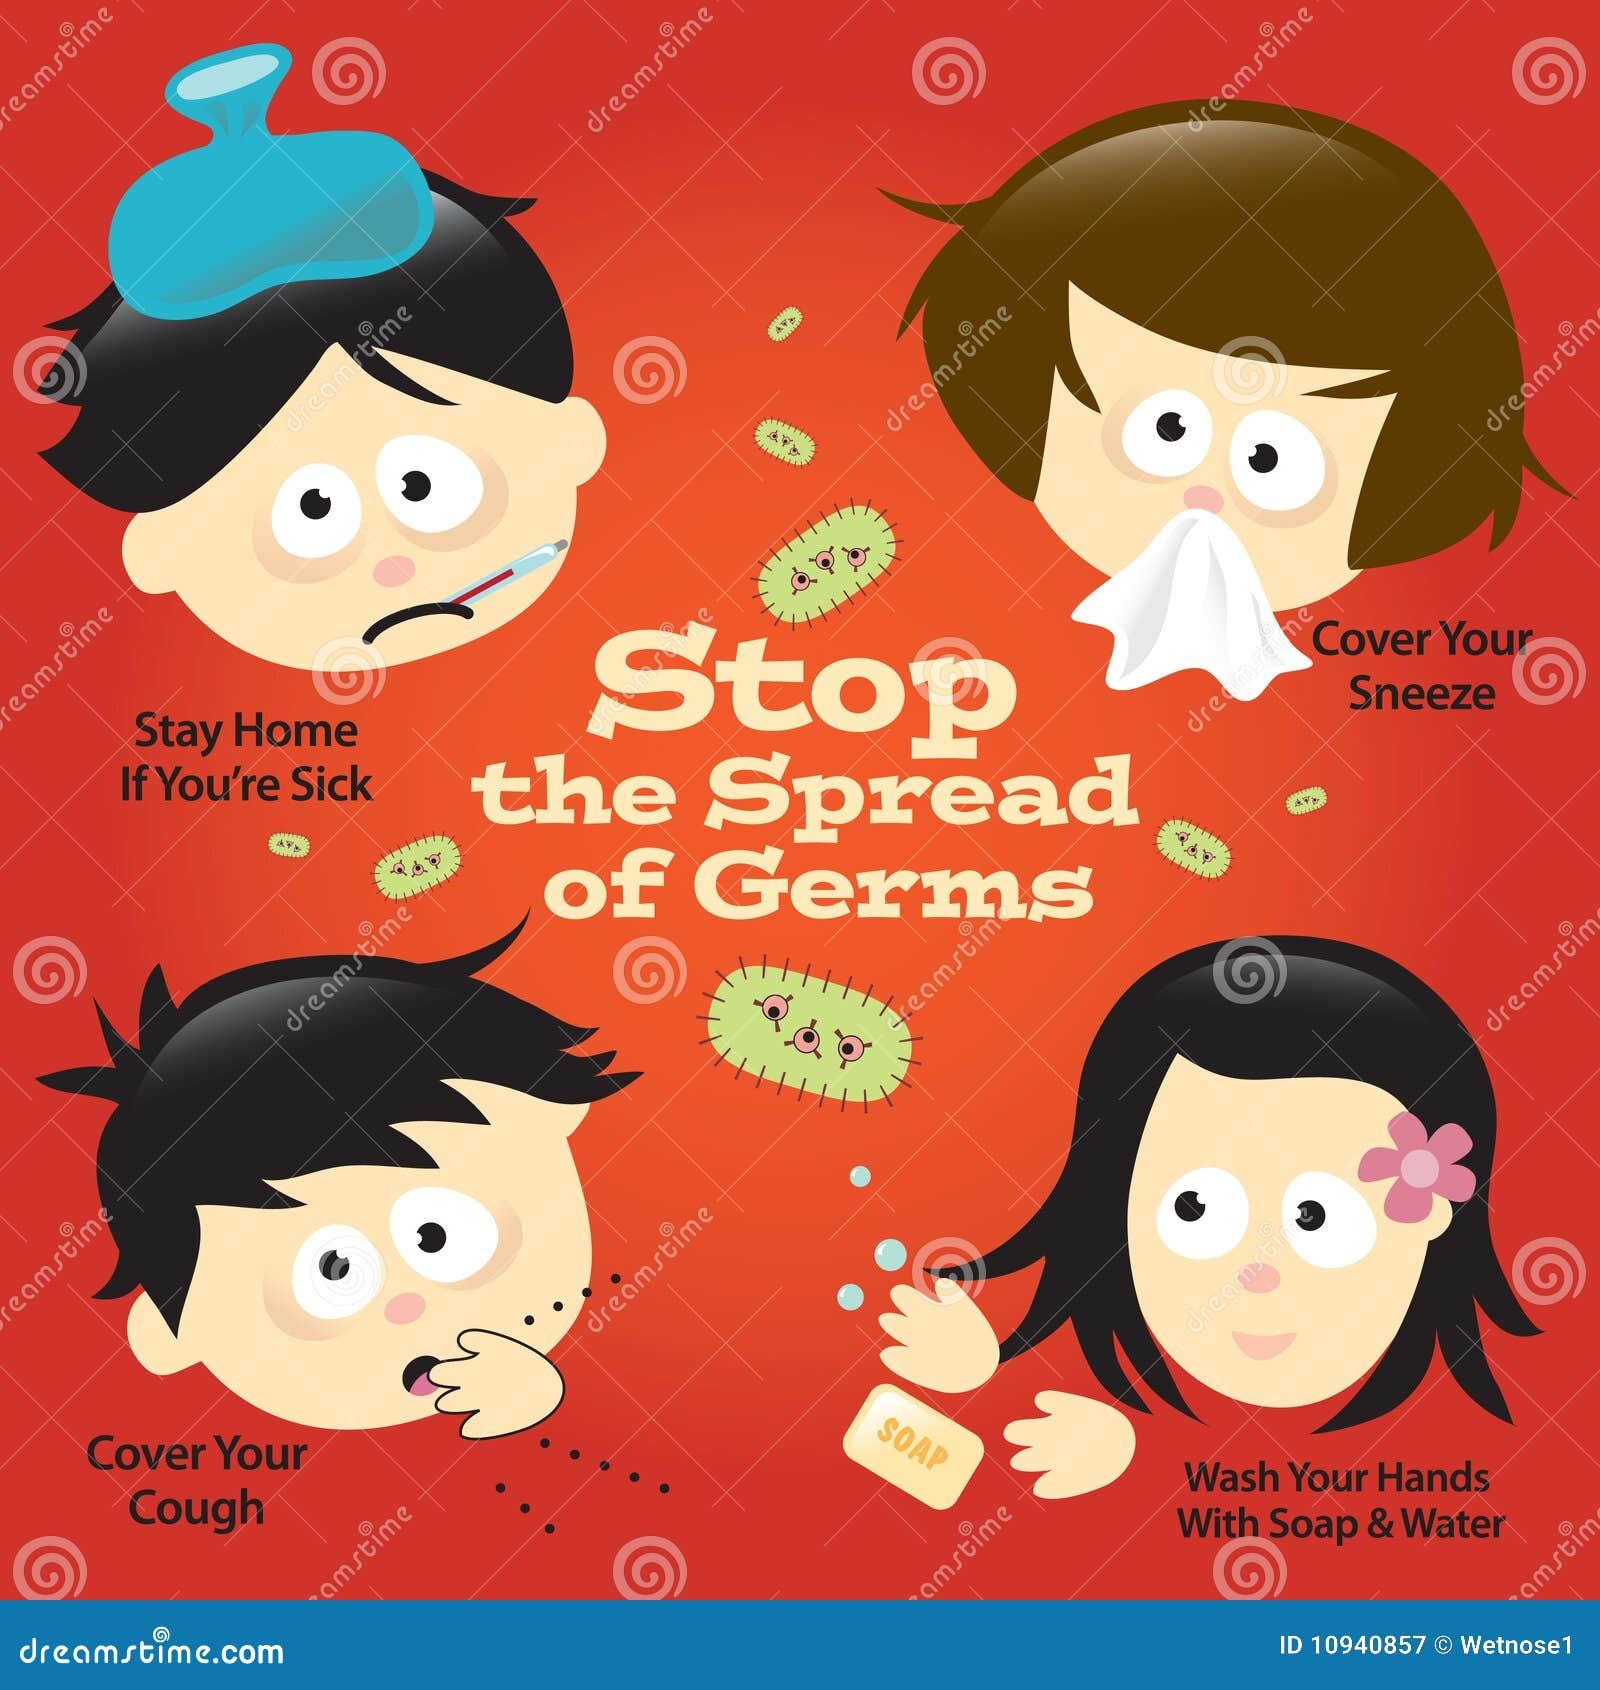 Flu Prevention Poster Sign  H1n1 Prevention Poster